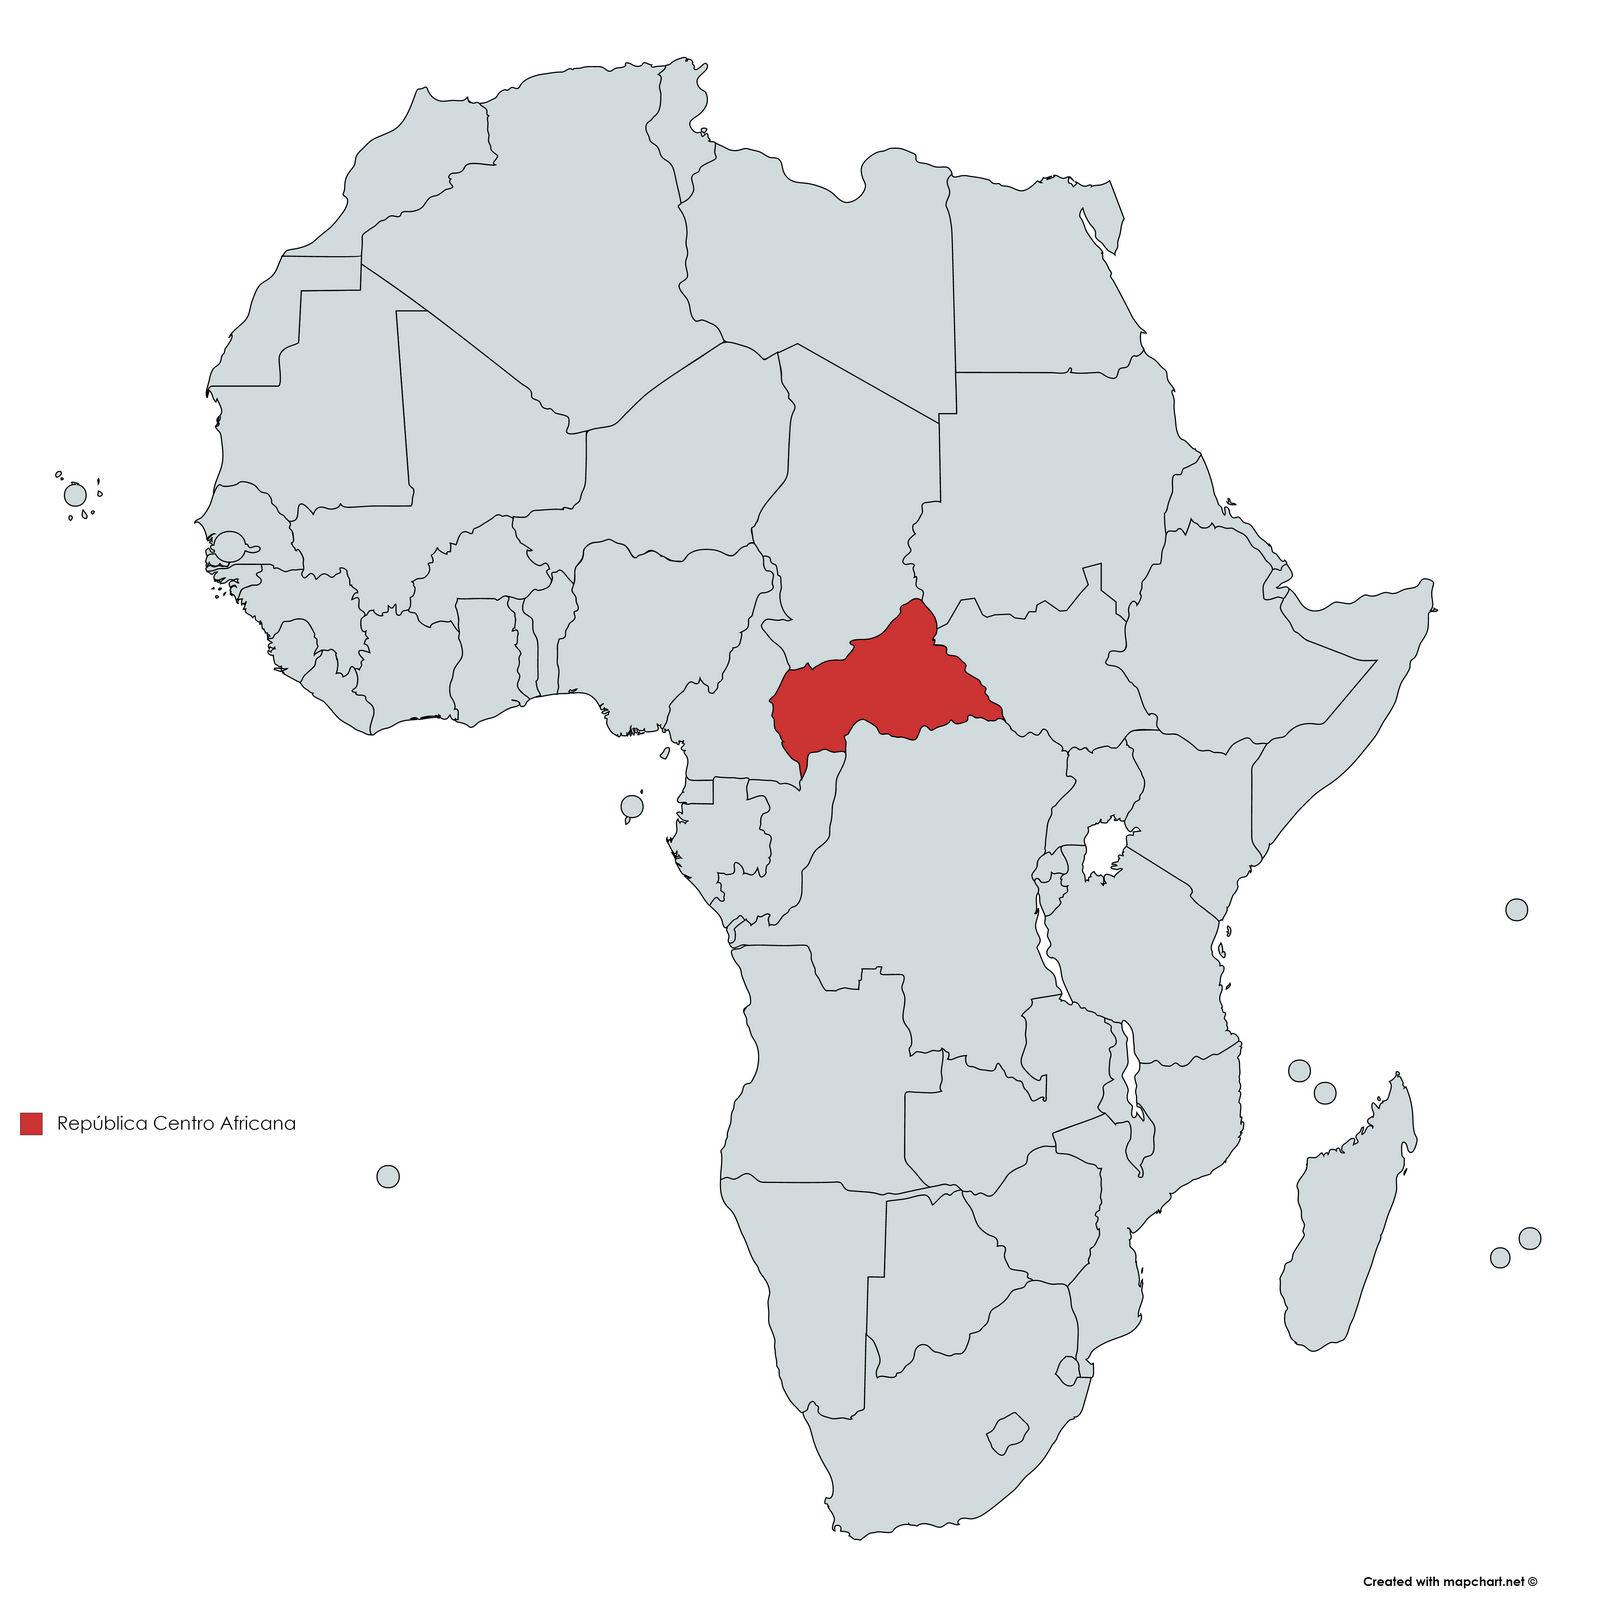 MAPA REPUBLICA CENTRO AFRICANA